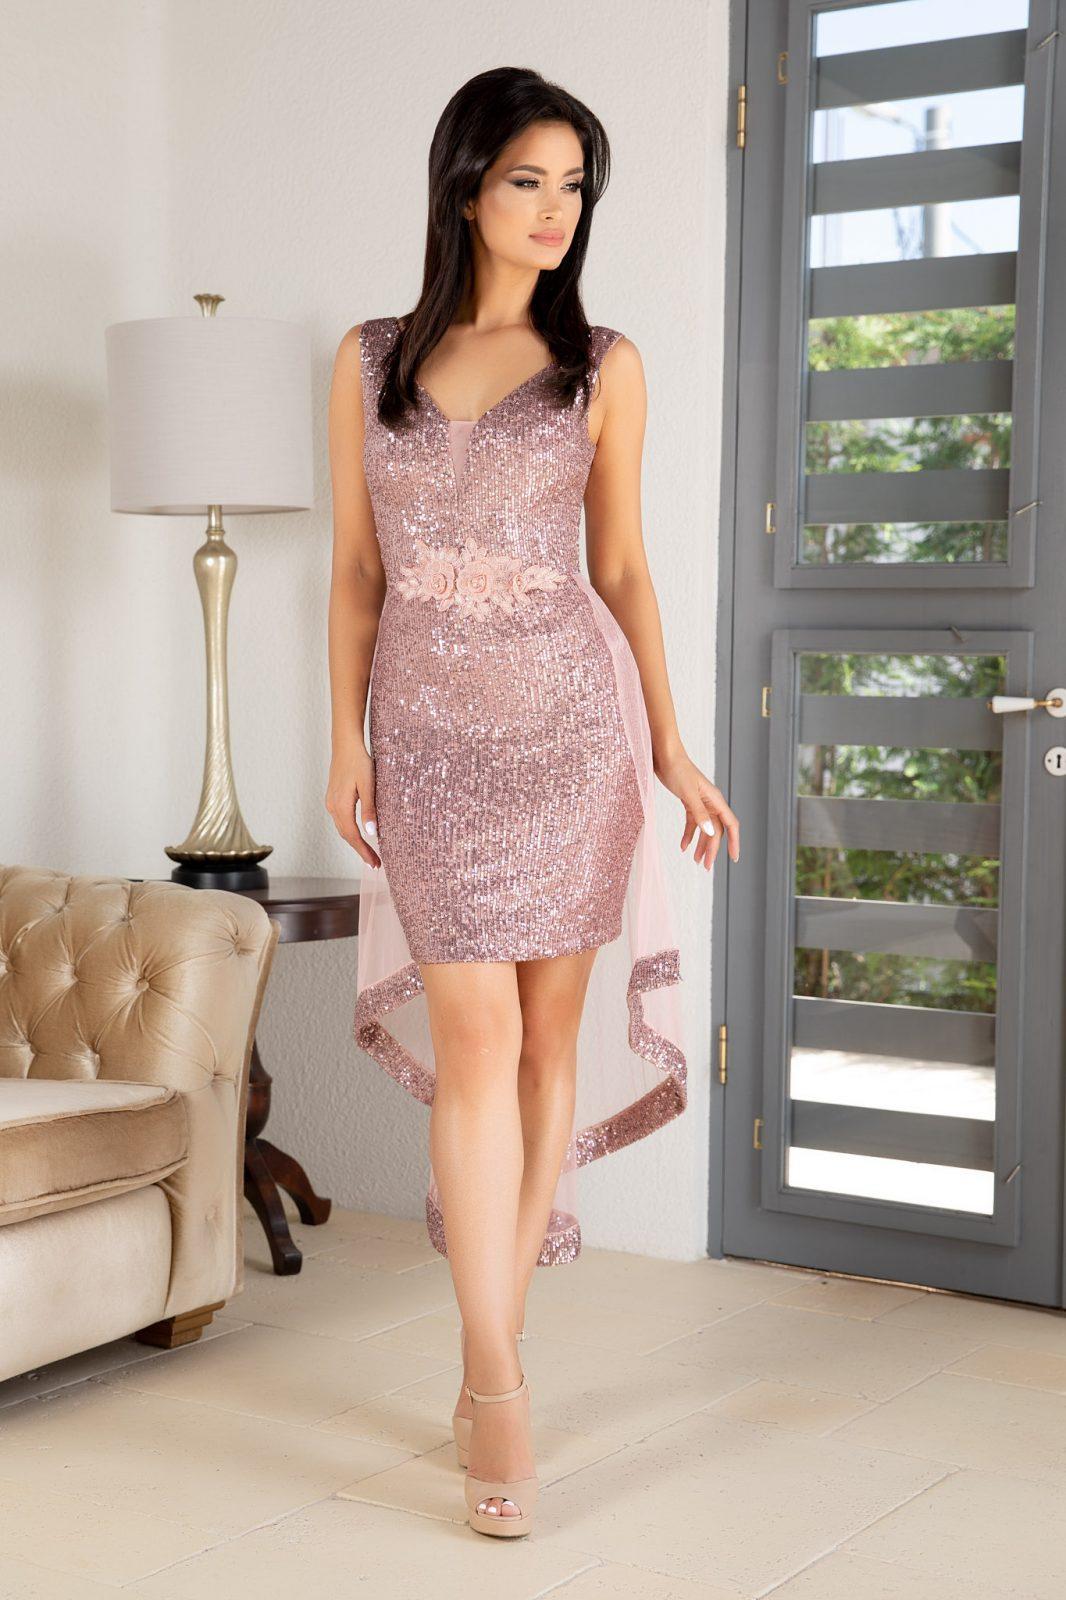 Amanda Ροζ Φόρεμα 4889